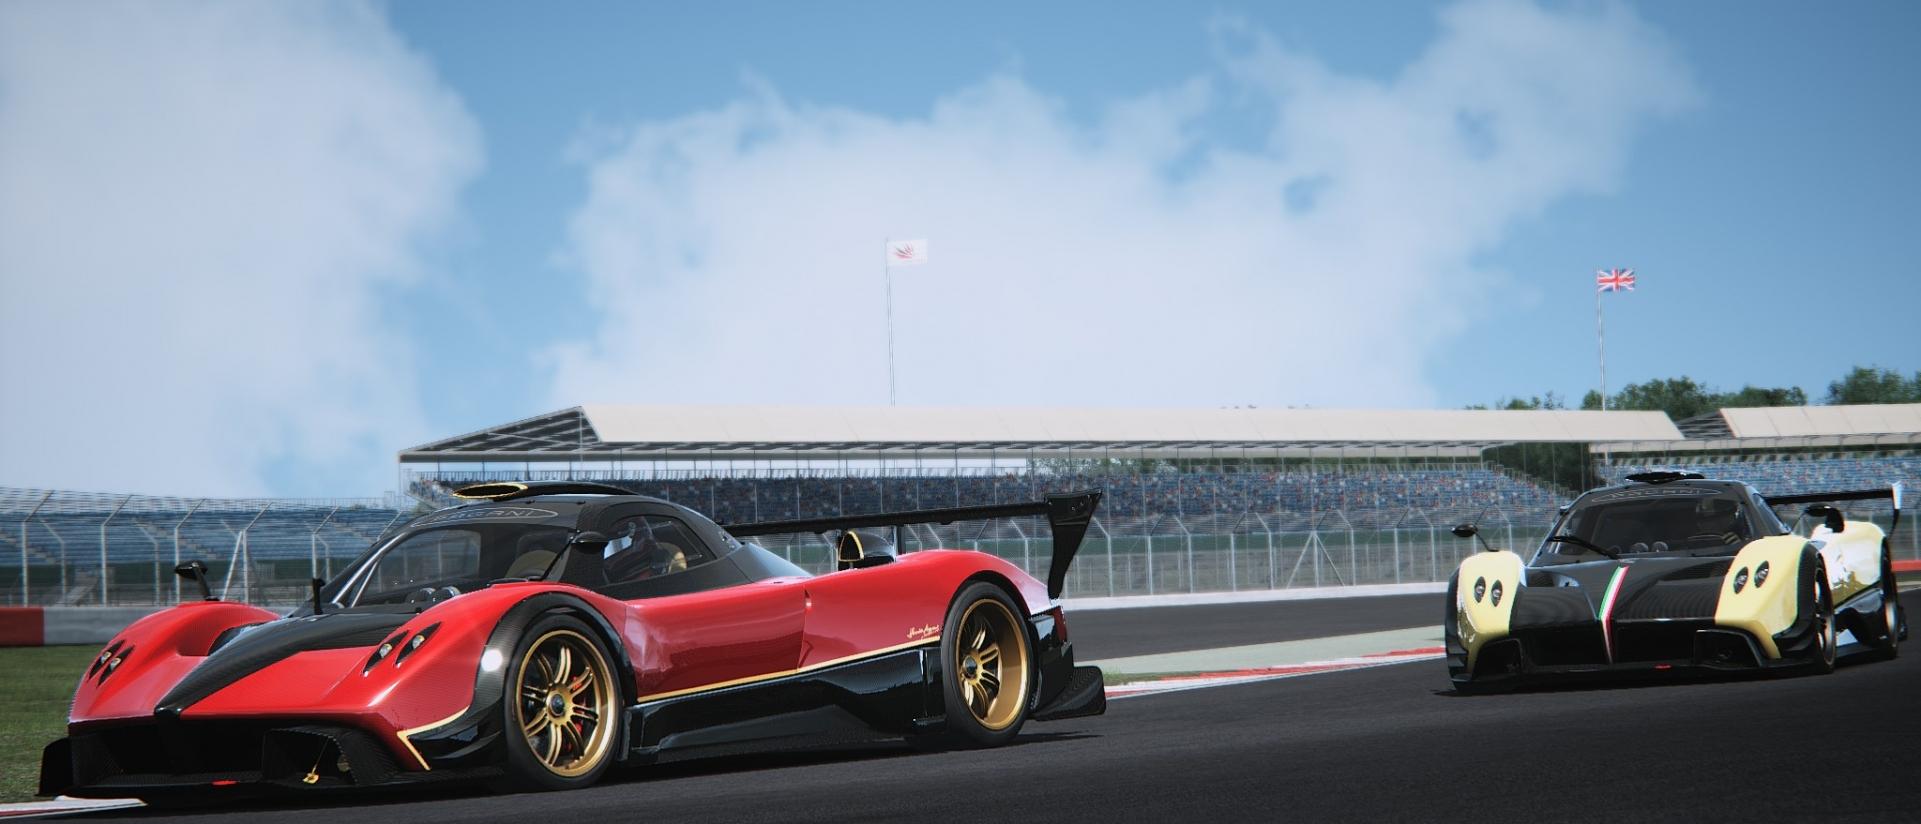 Assetto Corsa - Pagani Zonda Silverstone 02